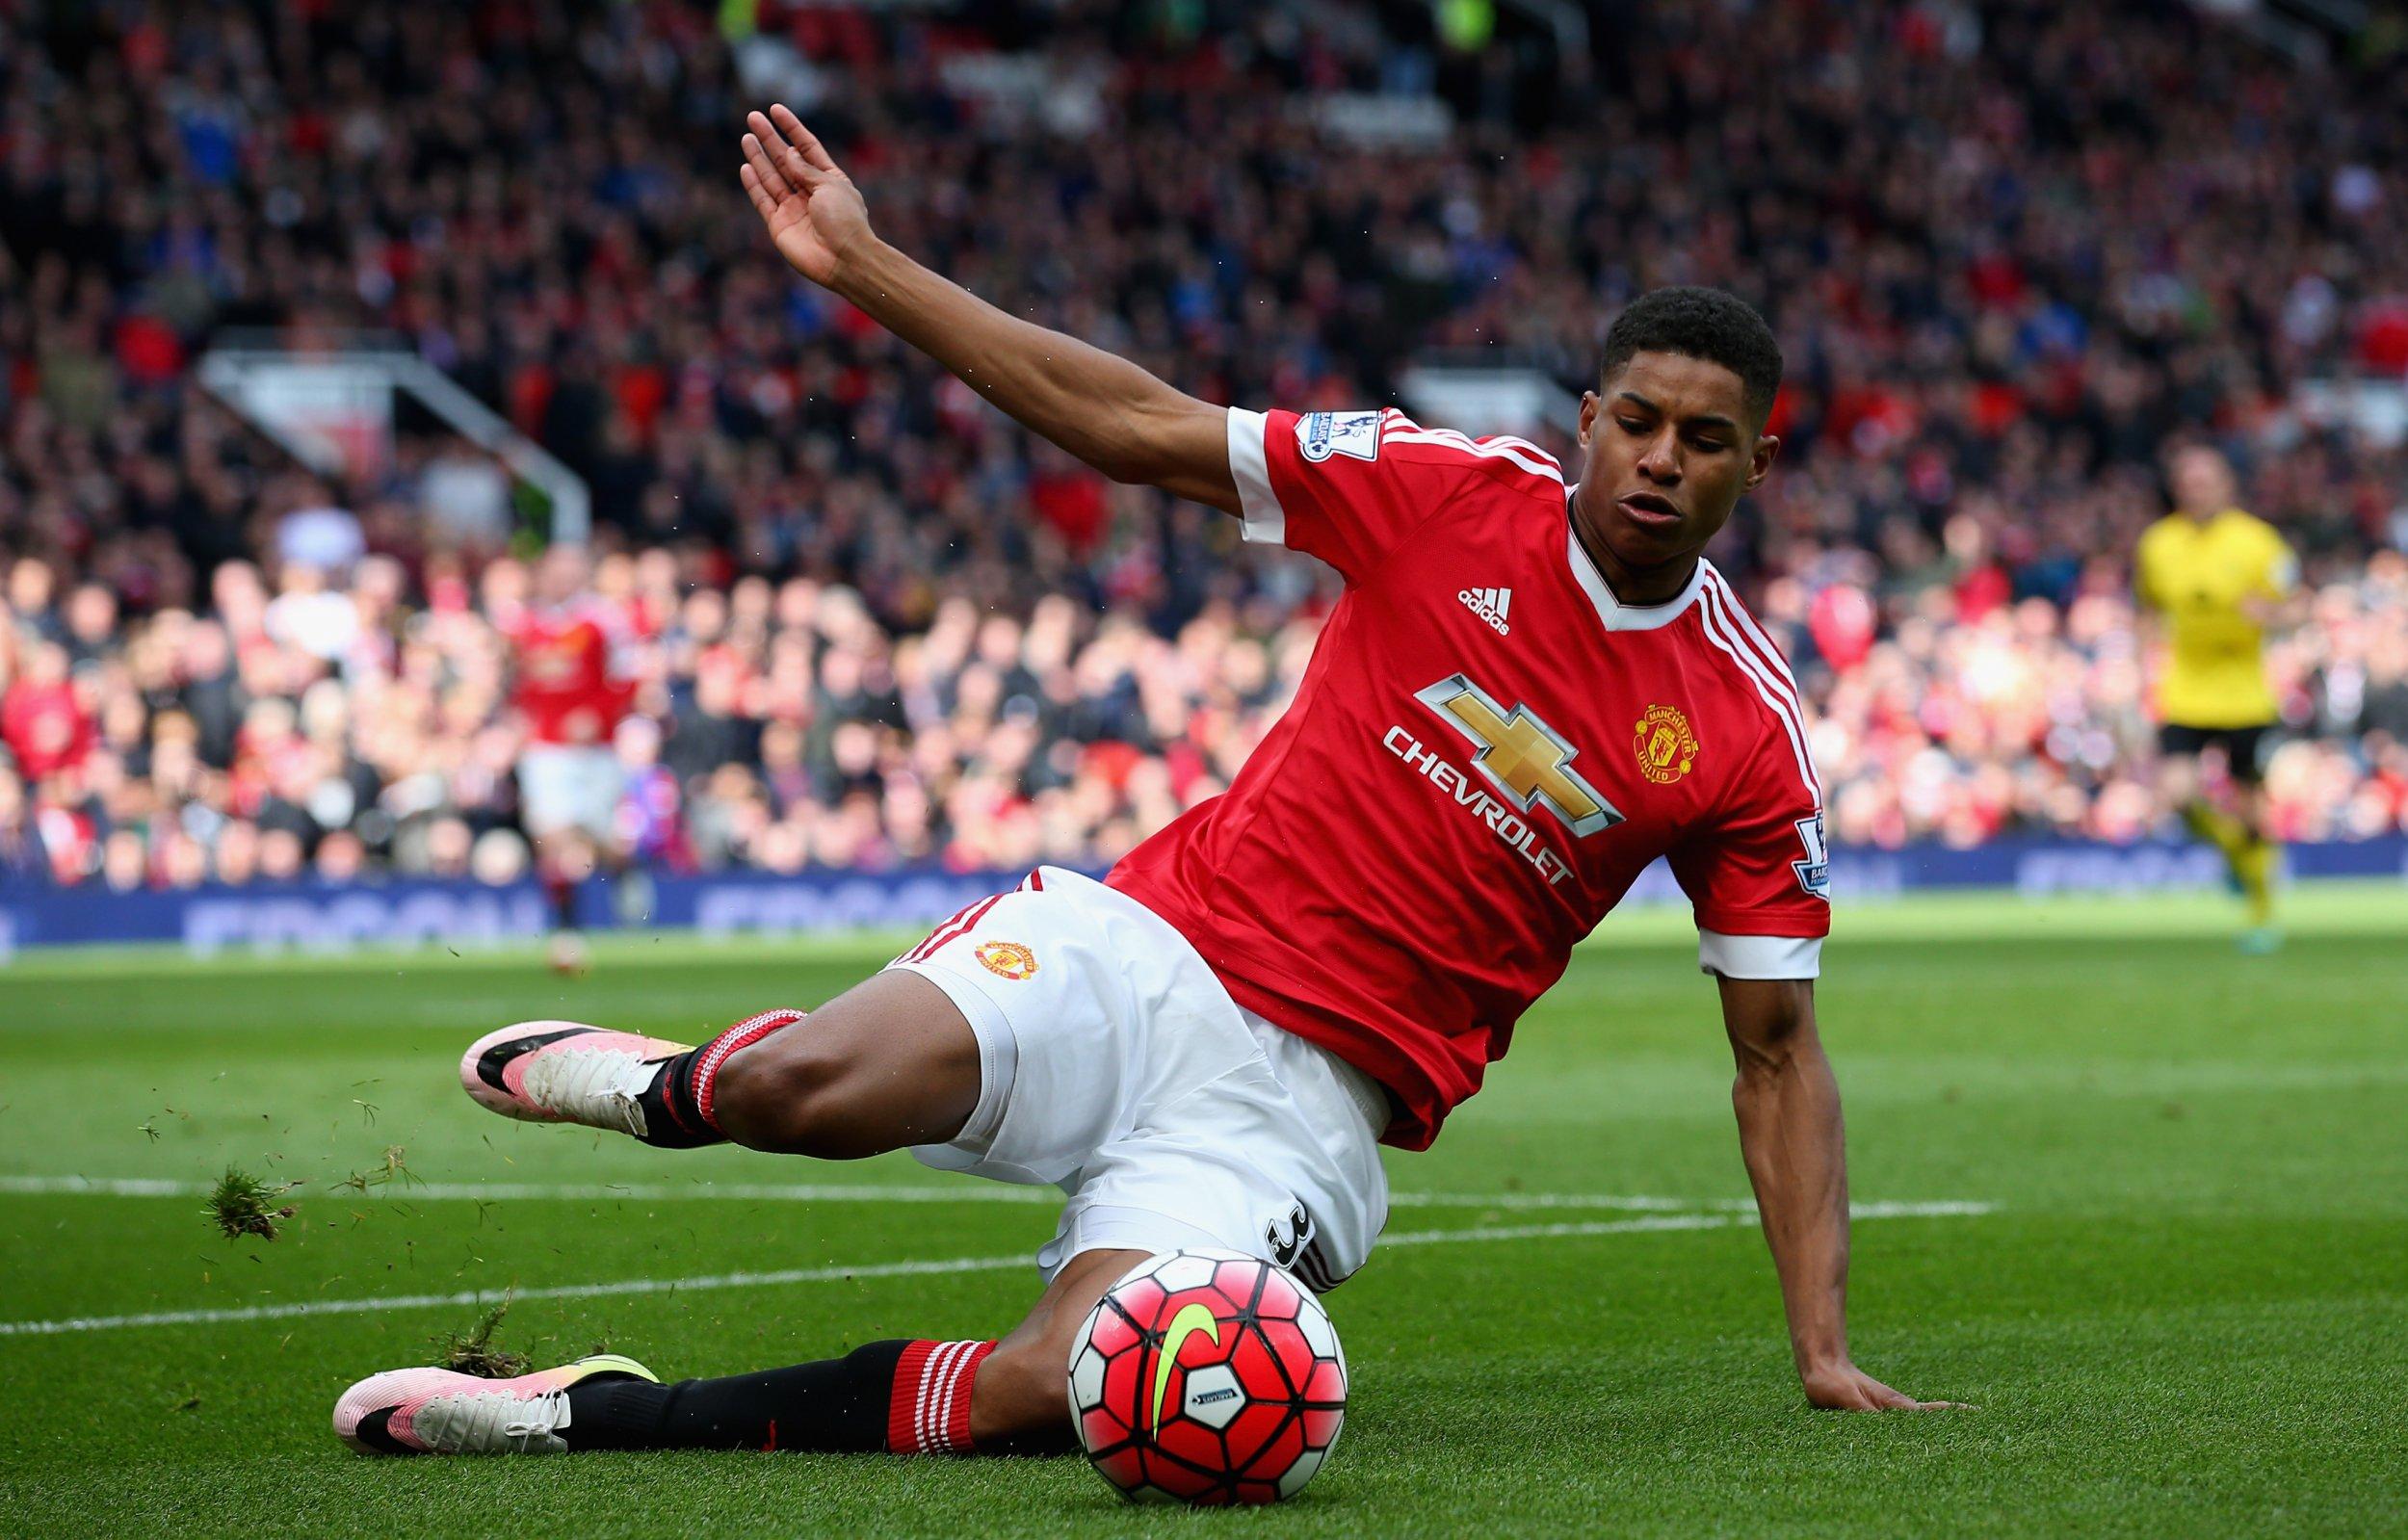 Image Result For Manchester United Wba